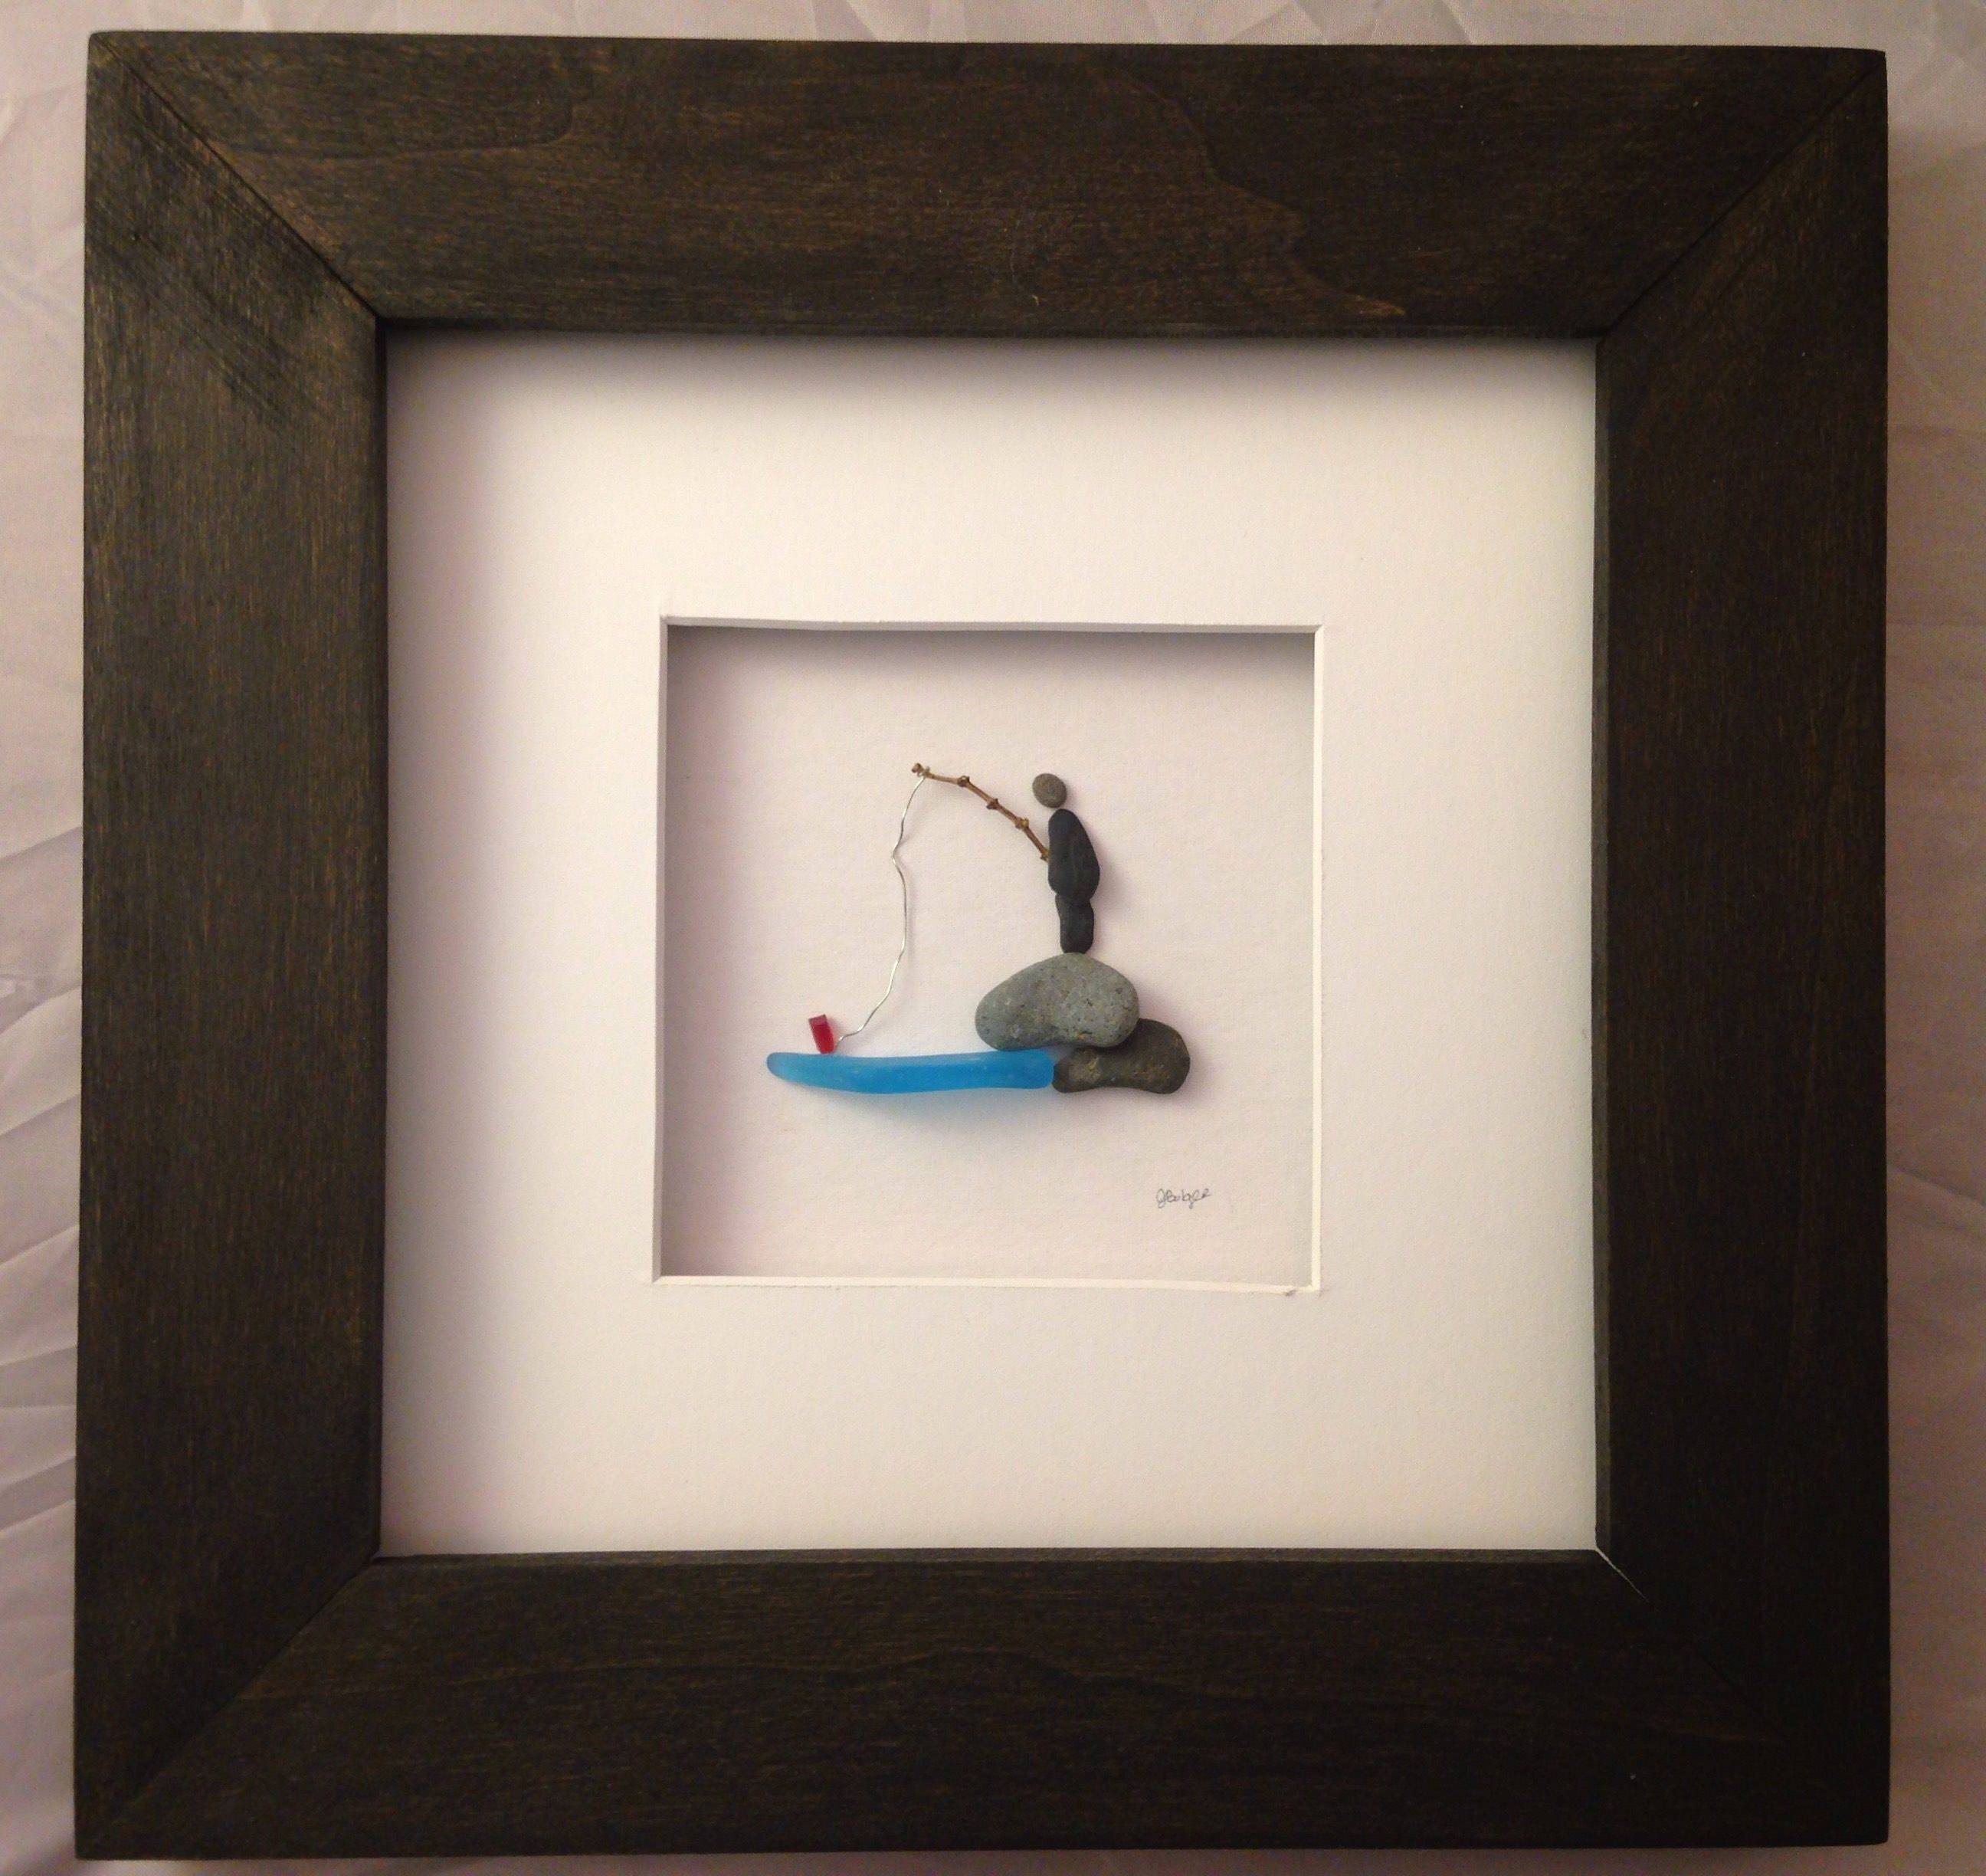 Pebble Art, Sea Glass Art U0027Iu0027d Rather Be Fishingu0027, 8x8 Framed Fishing Wall  Art, Office Decor, Man Cave Decor, Gift For Dad, Fathers Day Gift